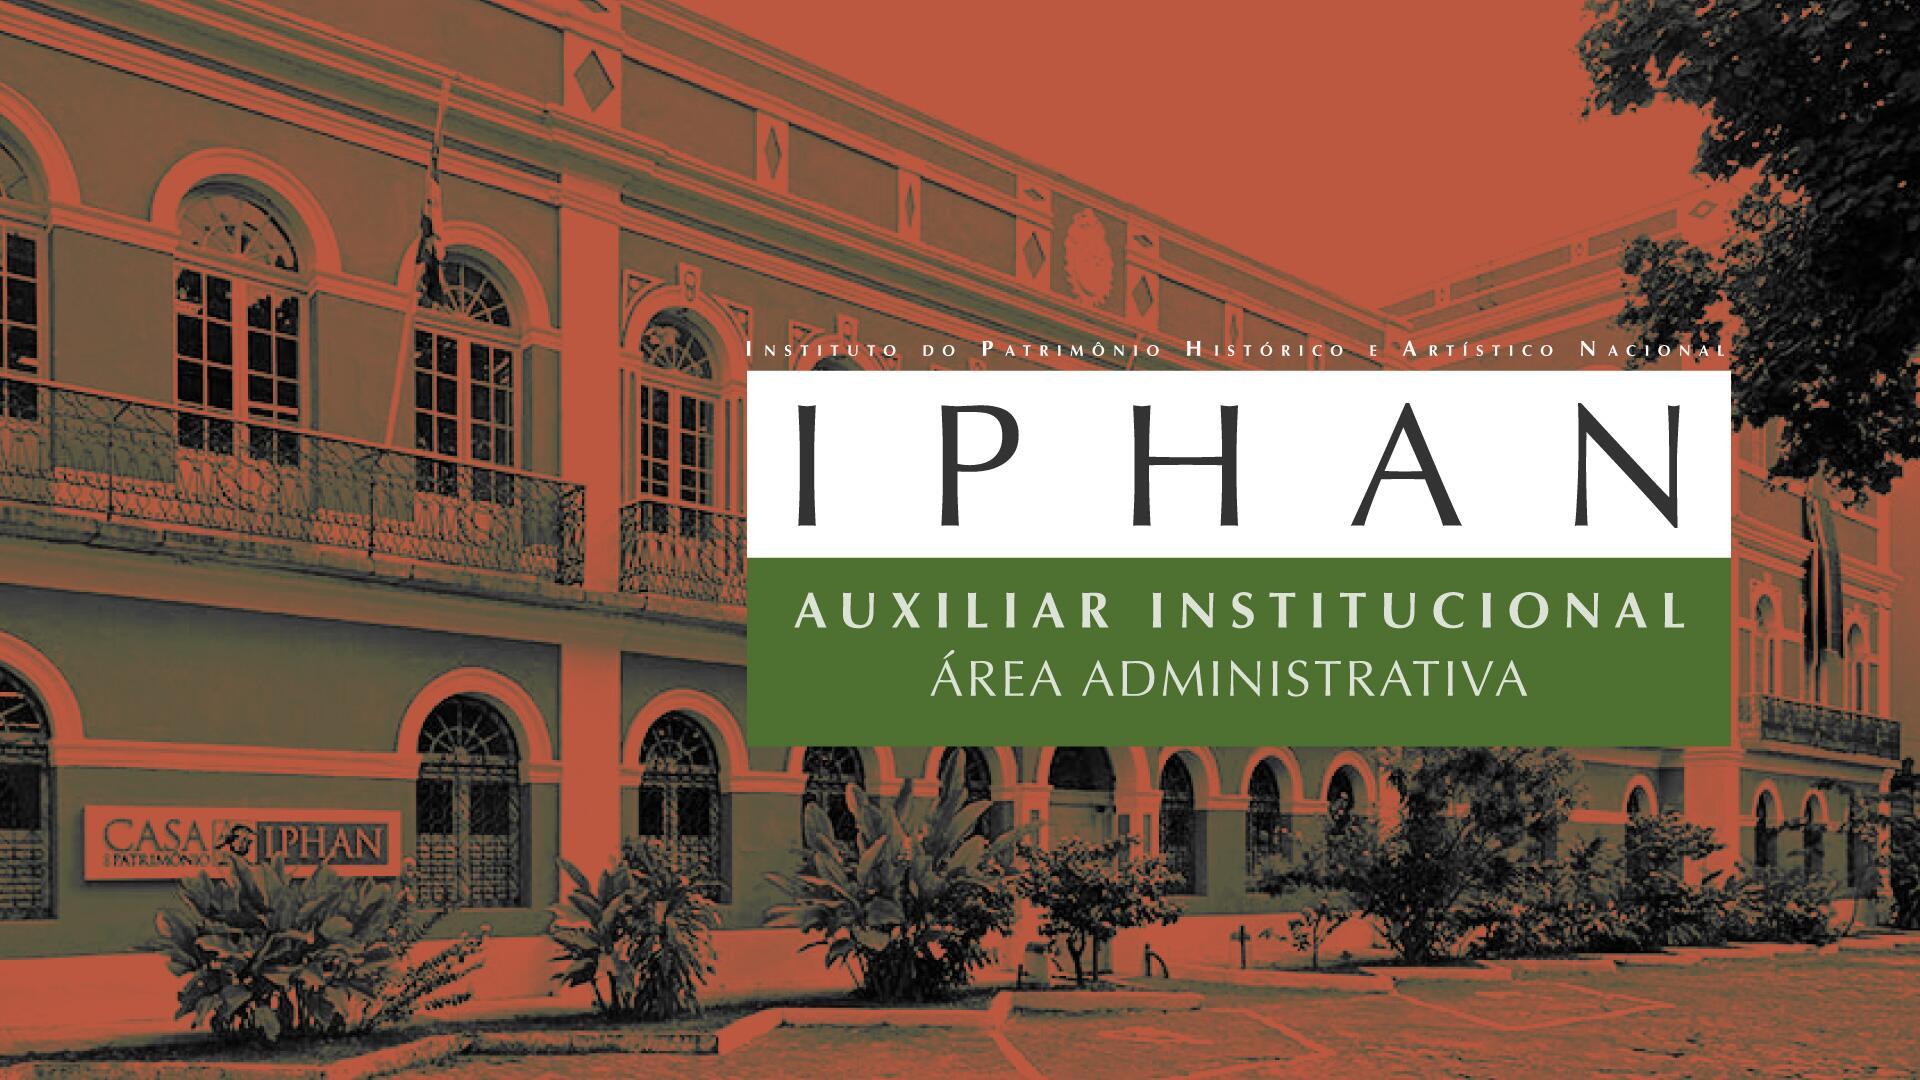 IPHAN - Auxiliar Institucional - Área administrativa